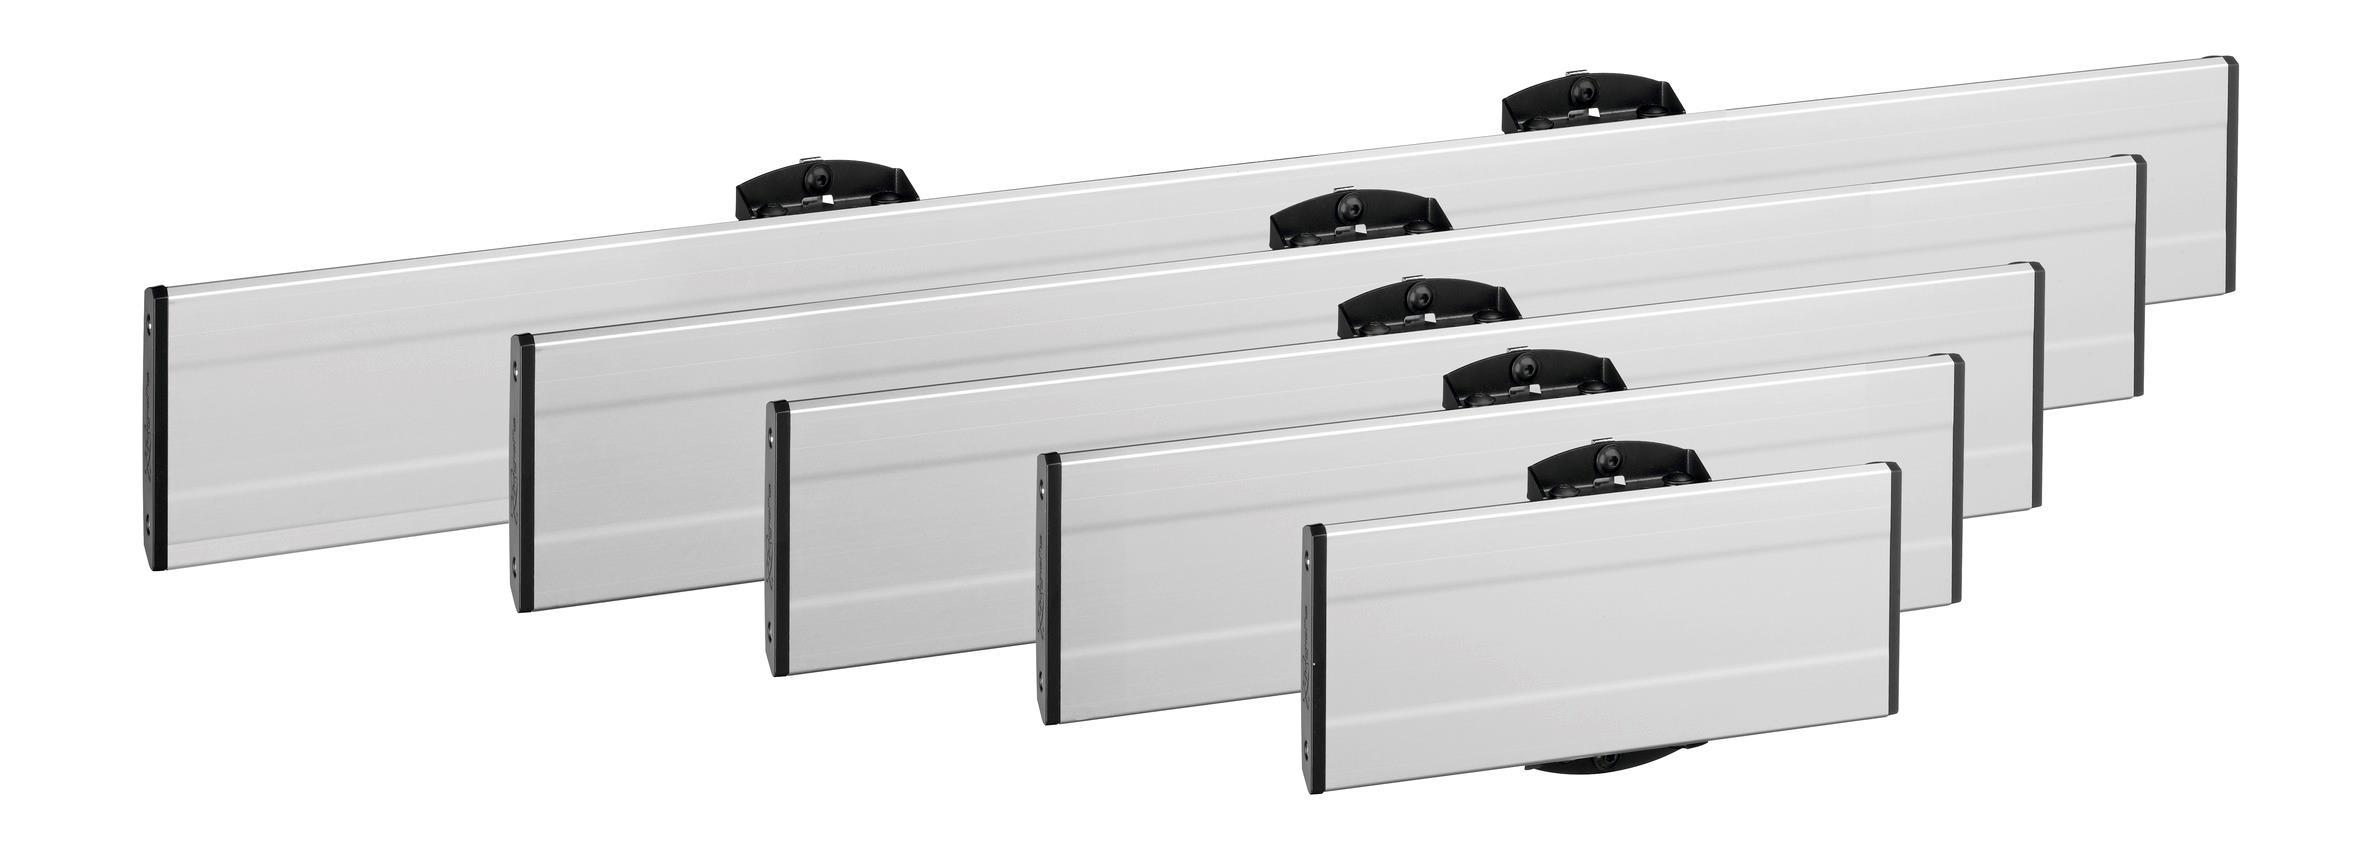 Vogels PFB 3409 Interface Bar 915mm (Silver)